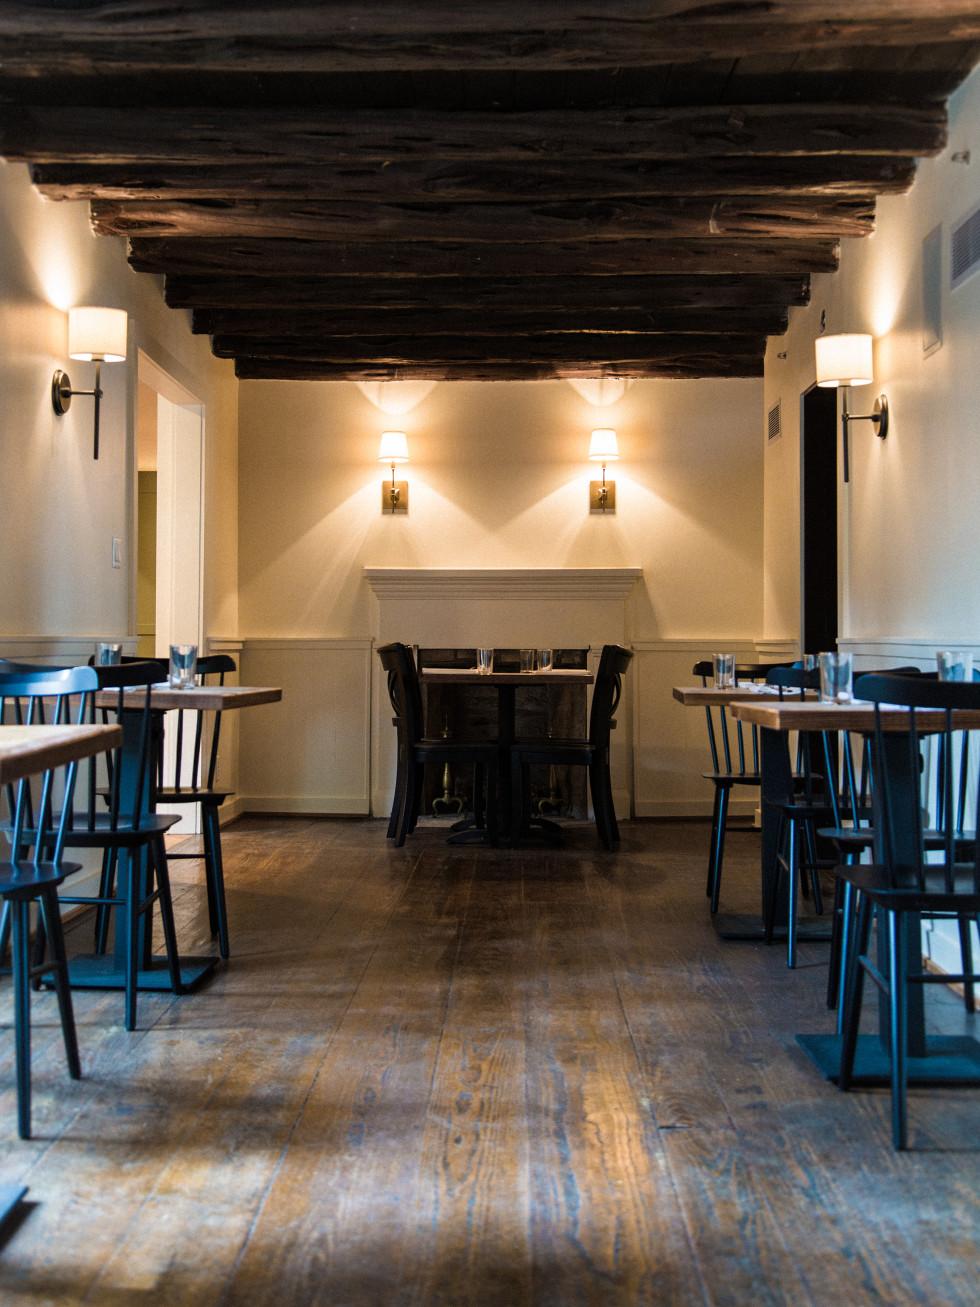 Stagecoach Inn dining room